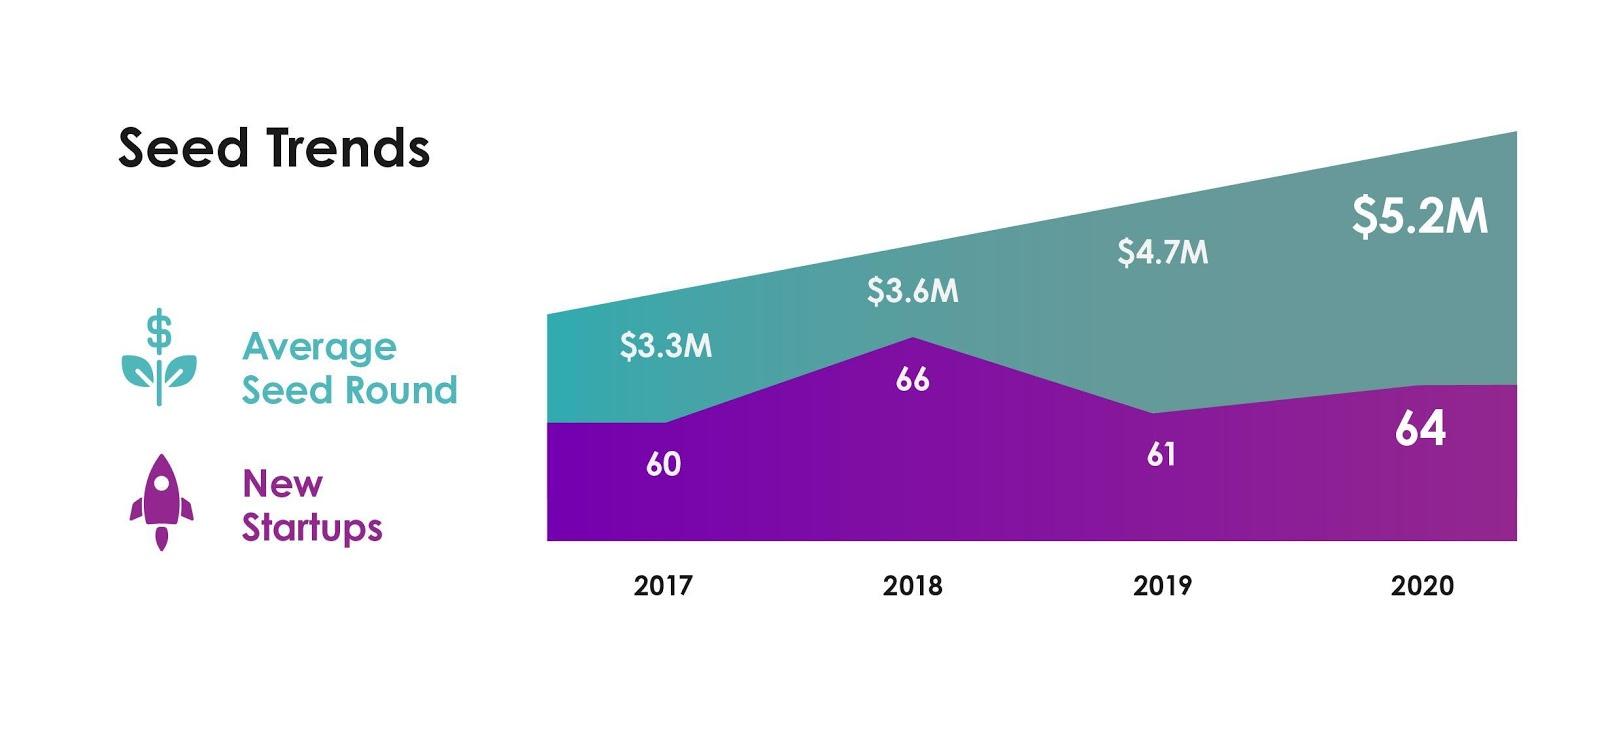 YL ventures seed trends 2020